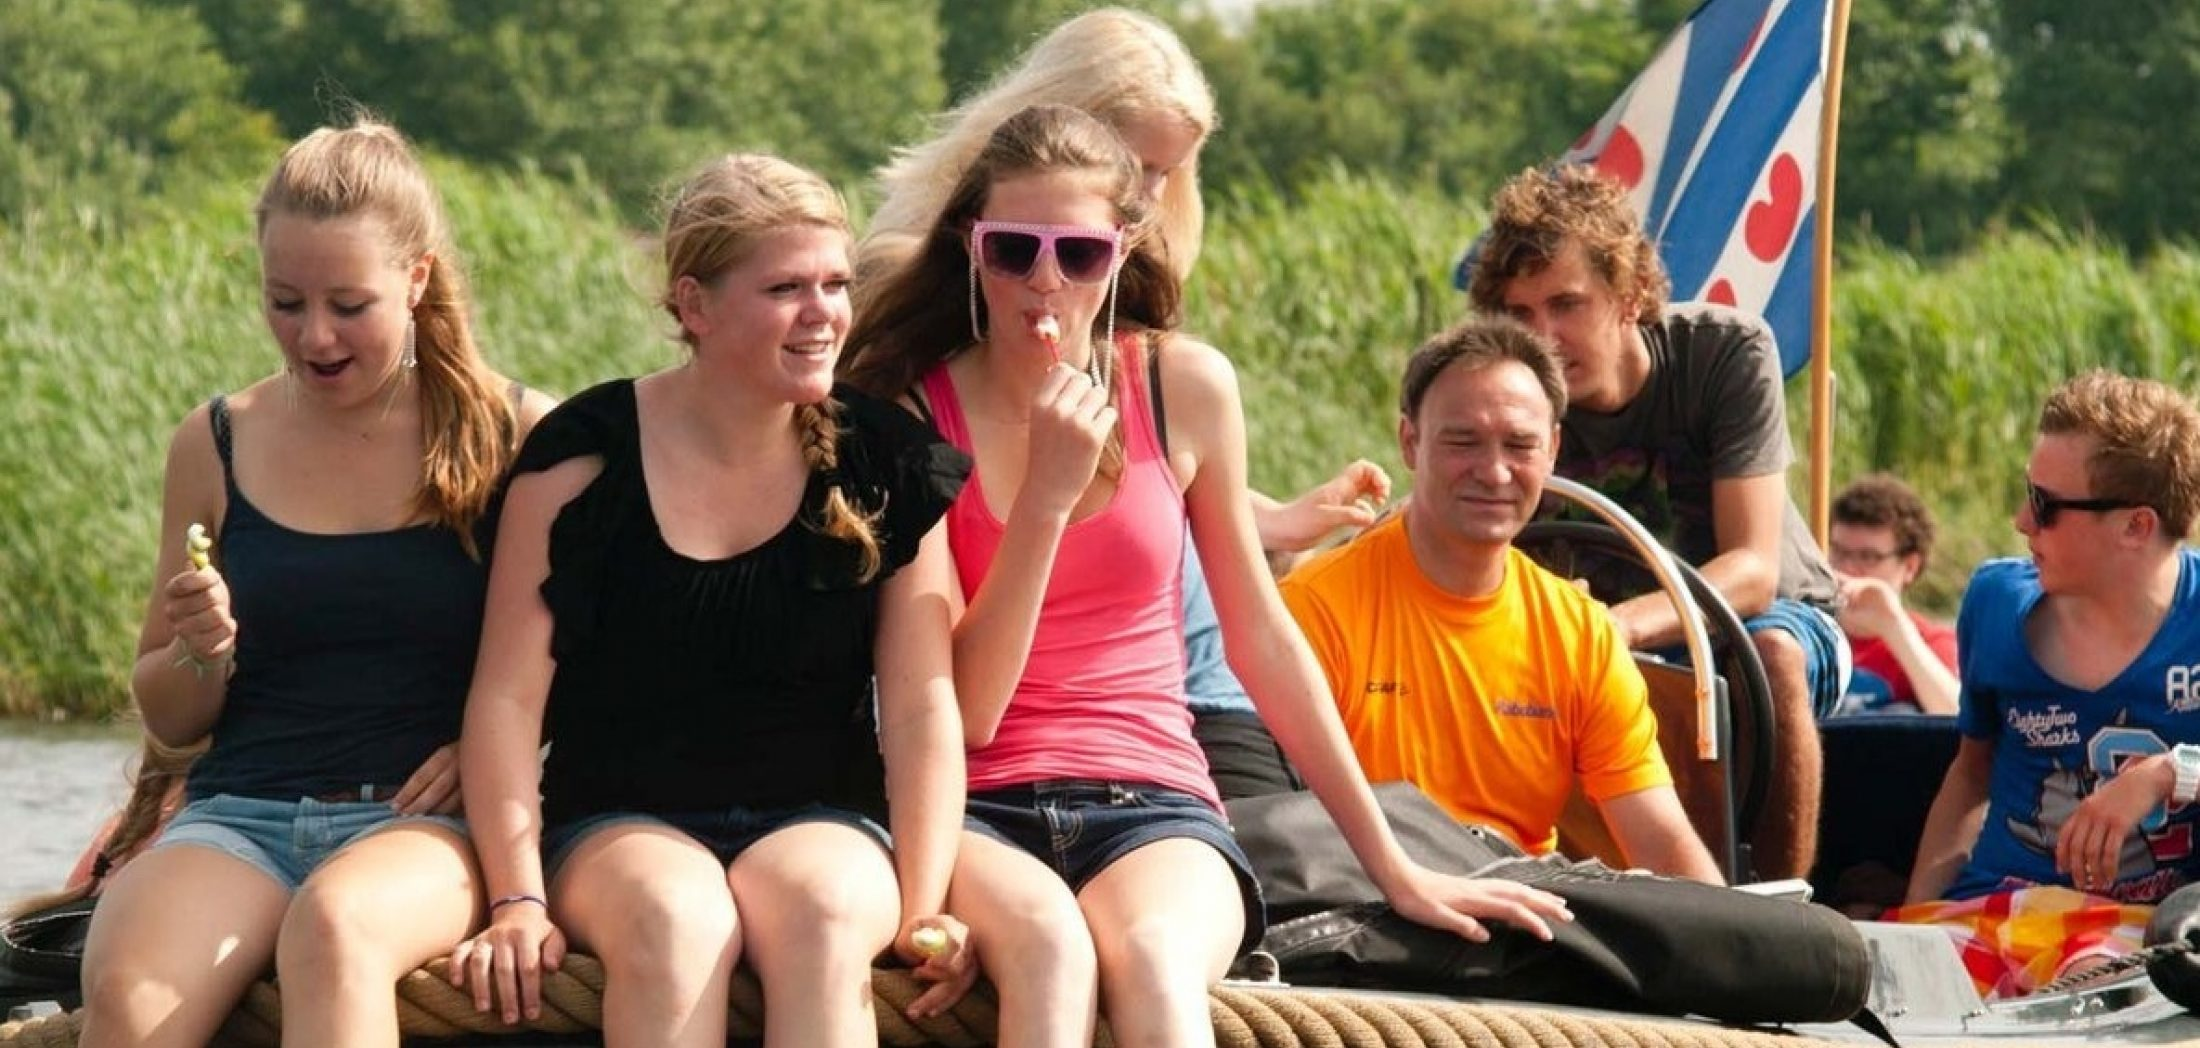 Hero image for Friesland 1 dag 5/48 pers. : collega's, vriend(inn)en, familie & teamgenoten